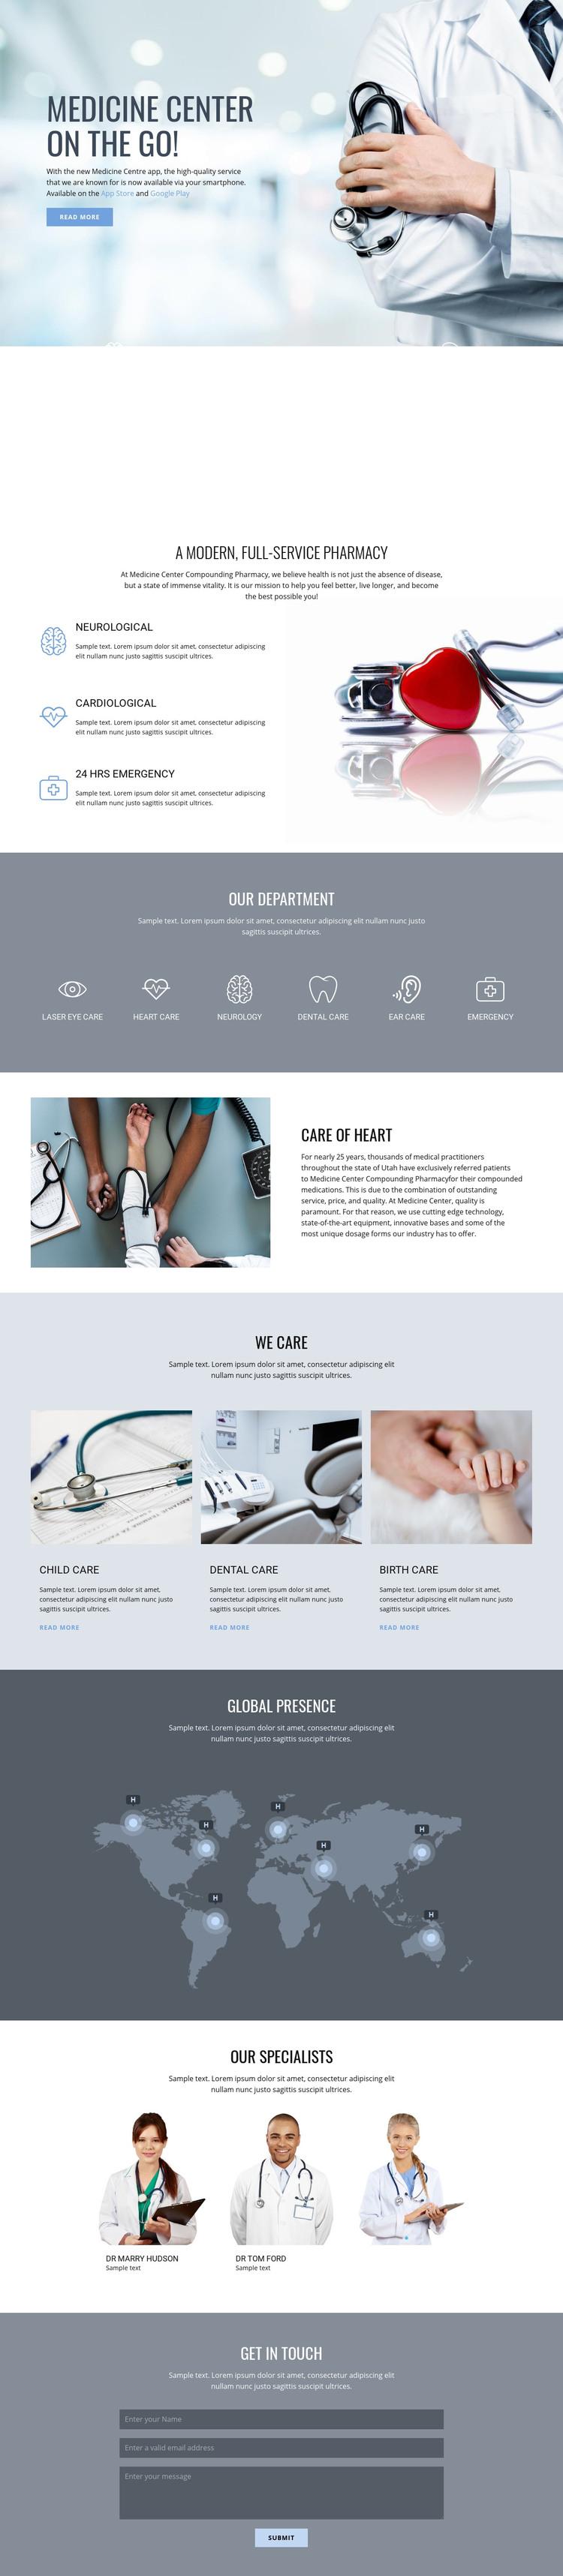 Pharmacy and medicine Homepage Design